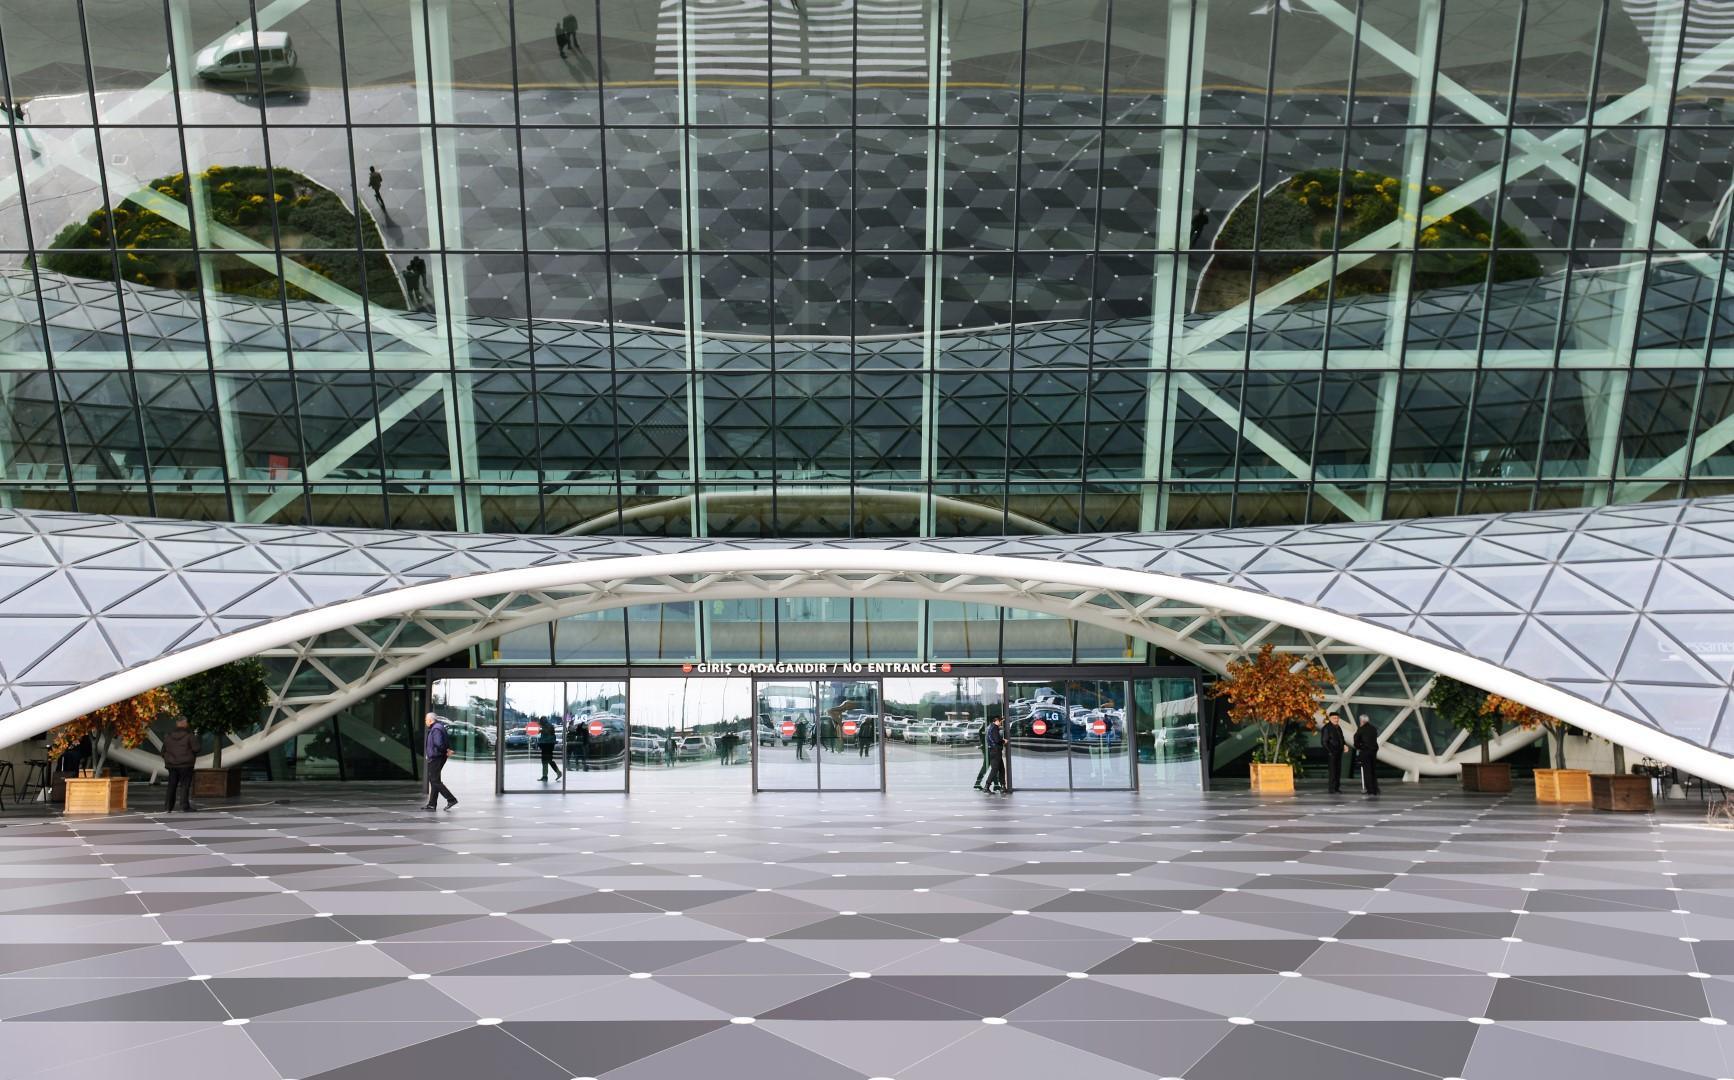 Baku Airport  - Baku airport 4 dekton id 1 59